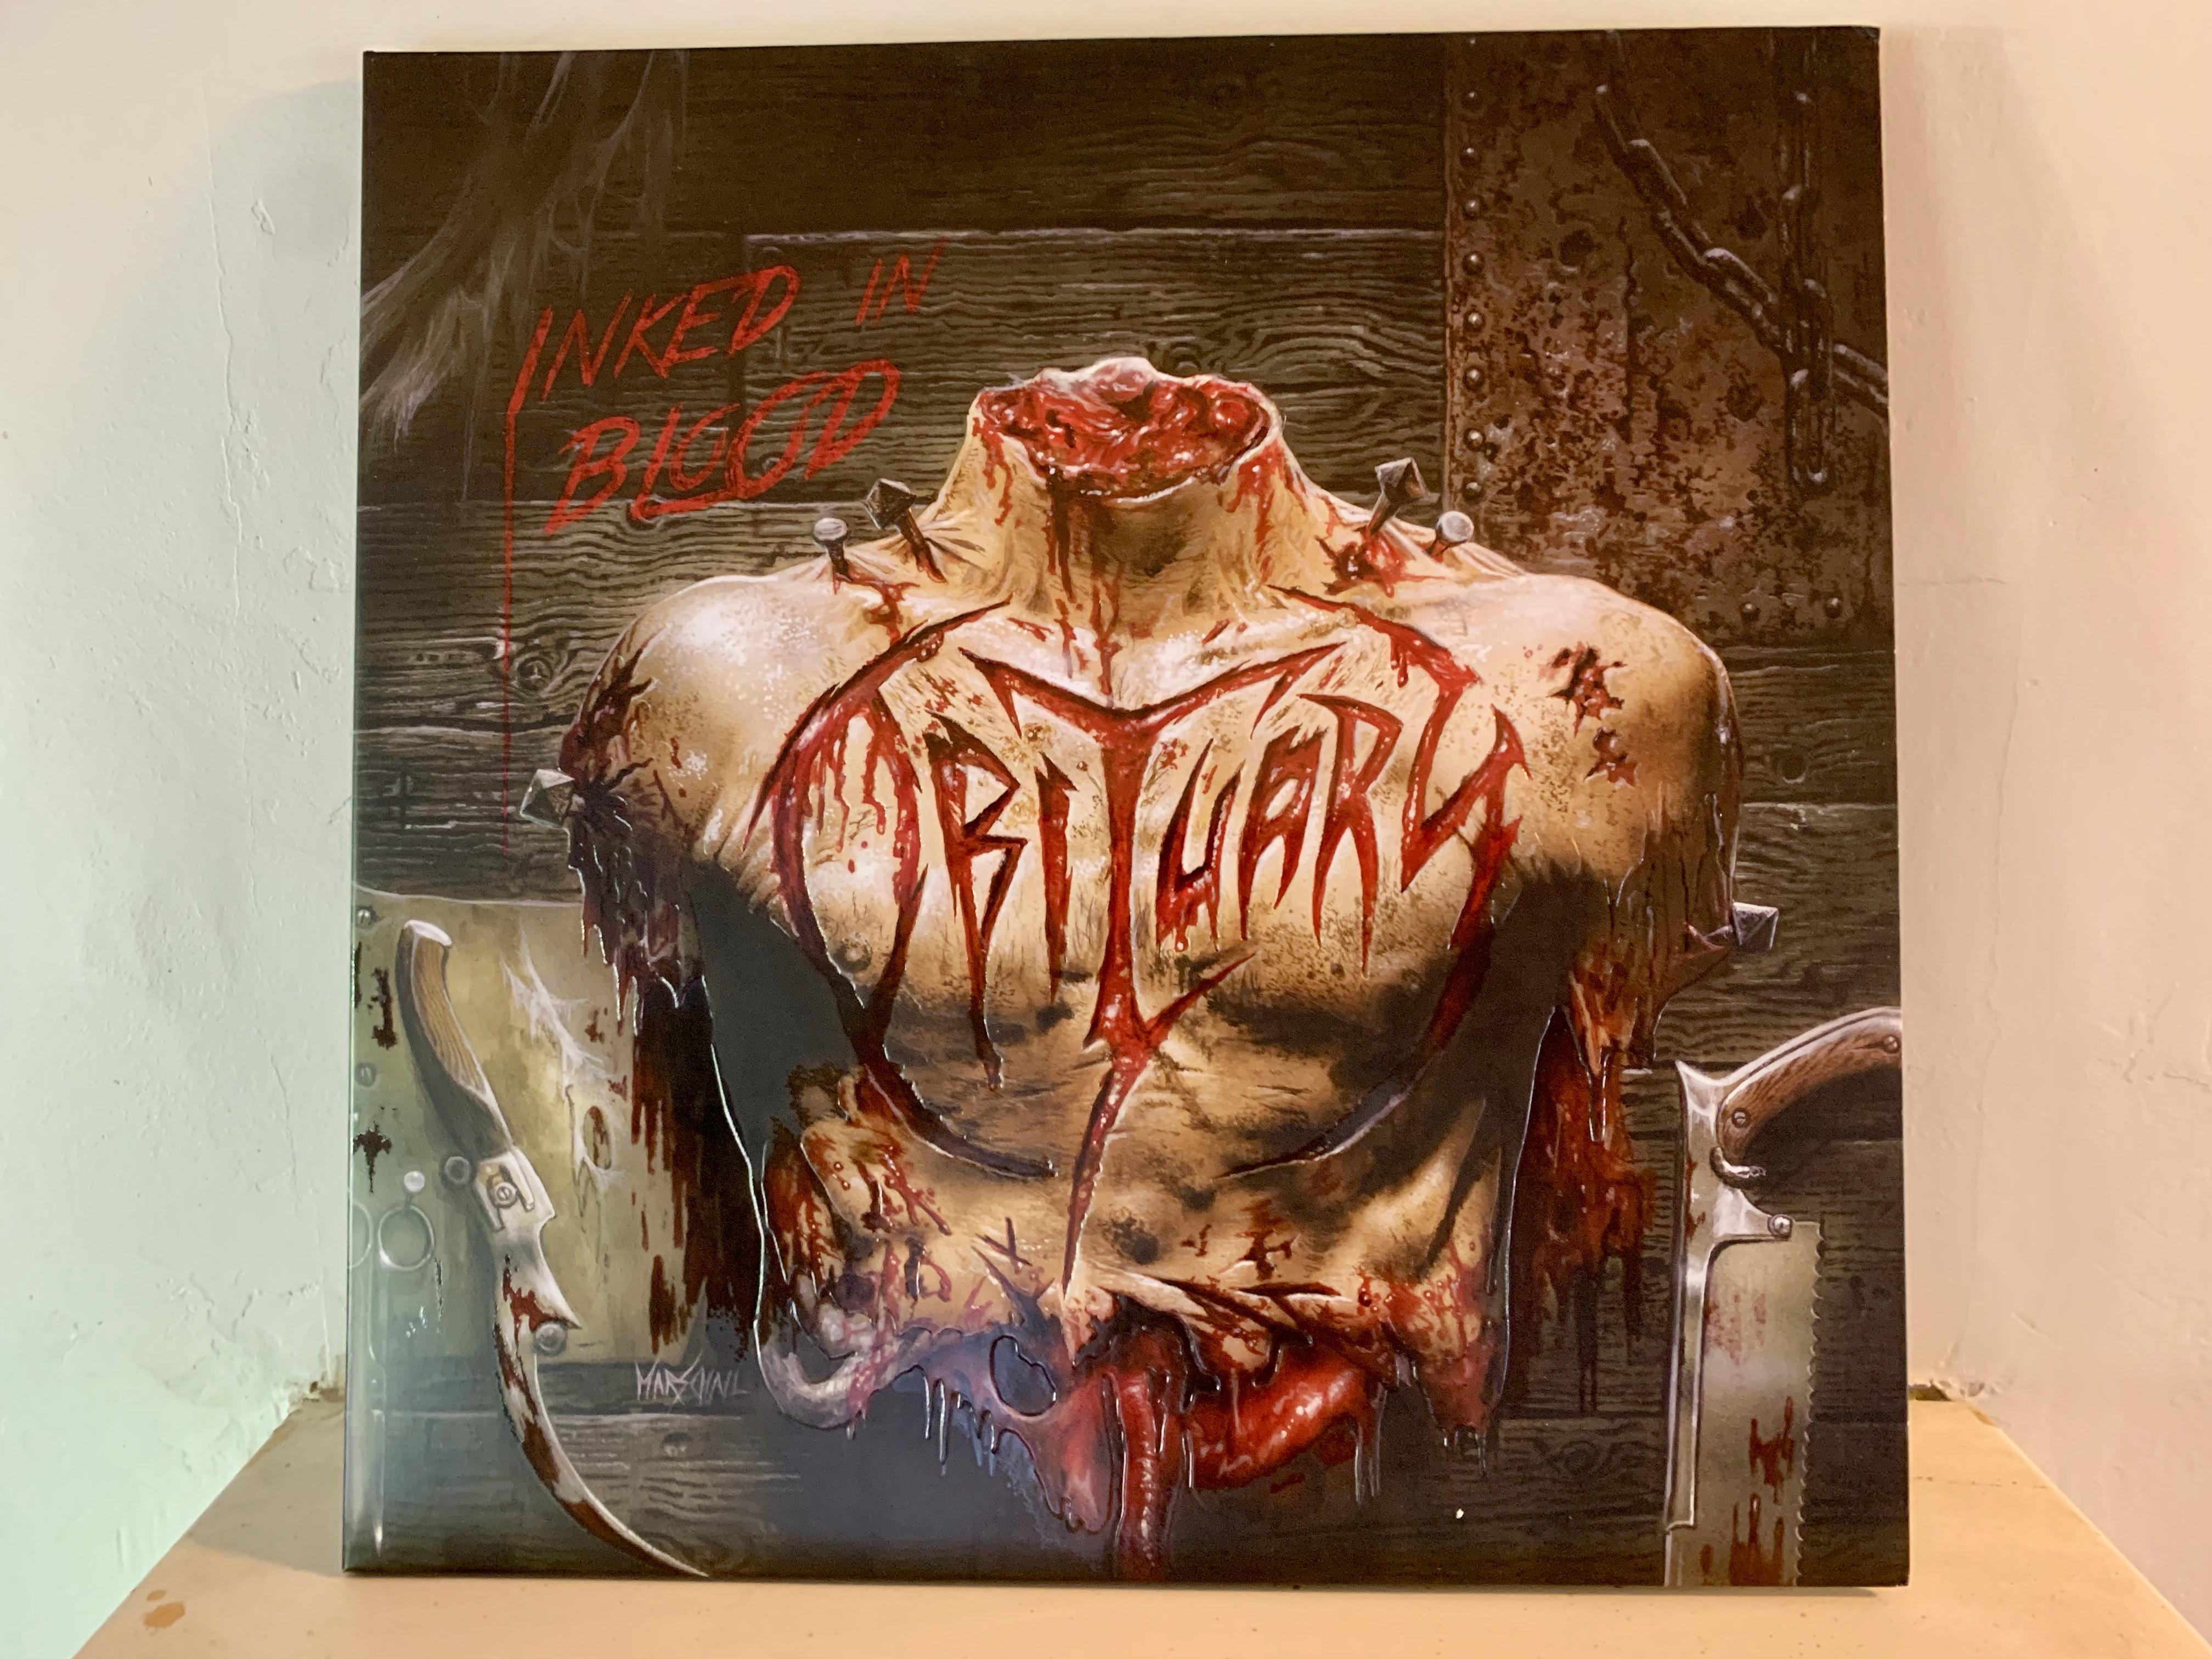 obituary vinyl